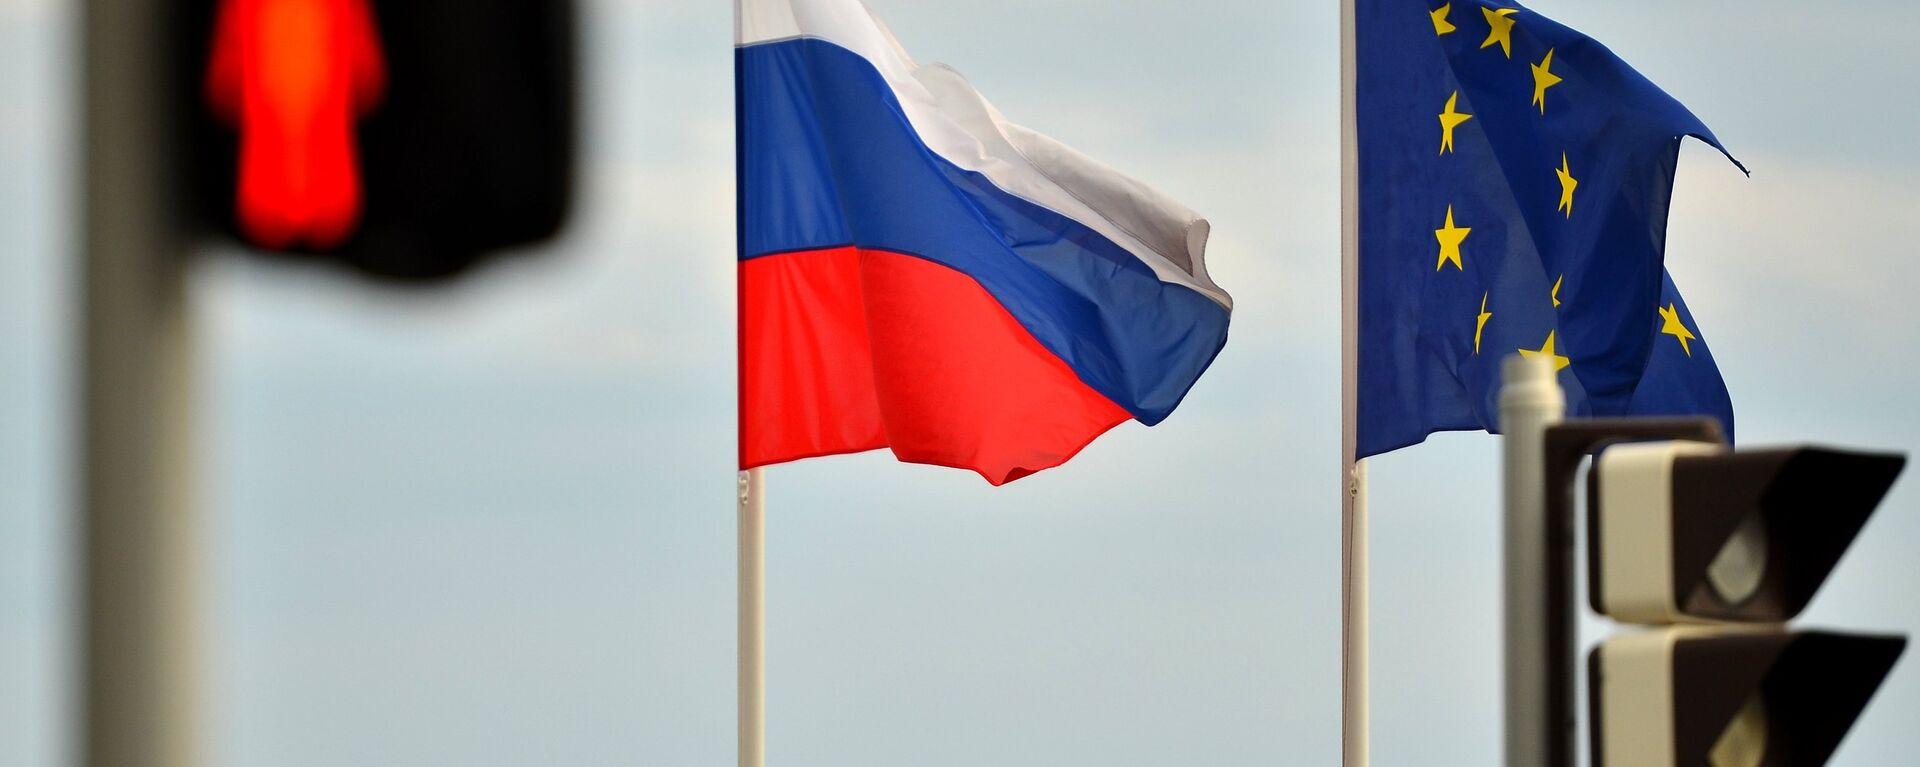 Флаги России и ЕС - Sputnik Latvija, 1920, 17.05.2021